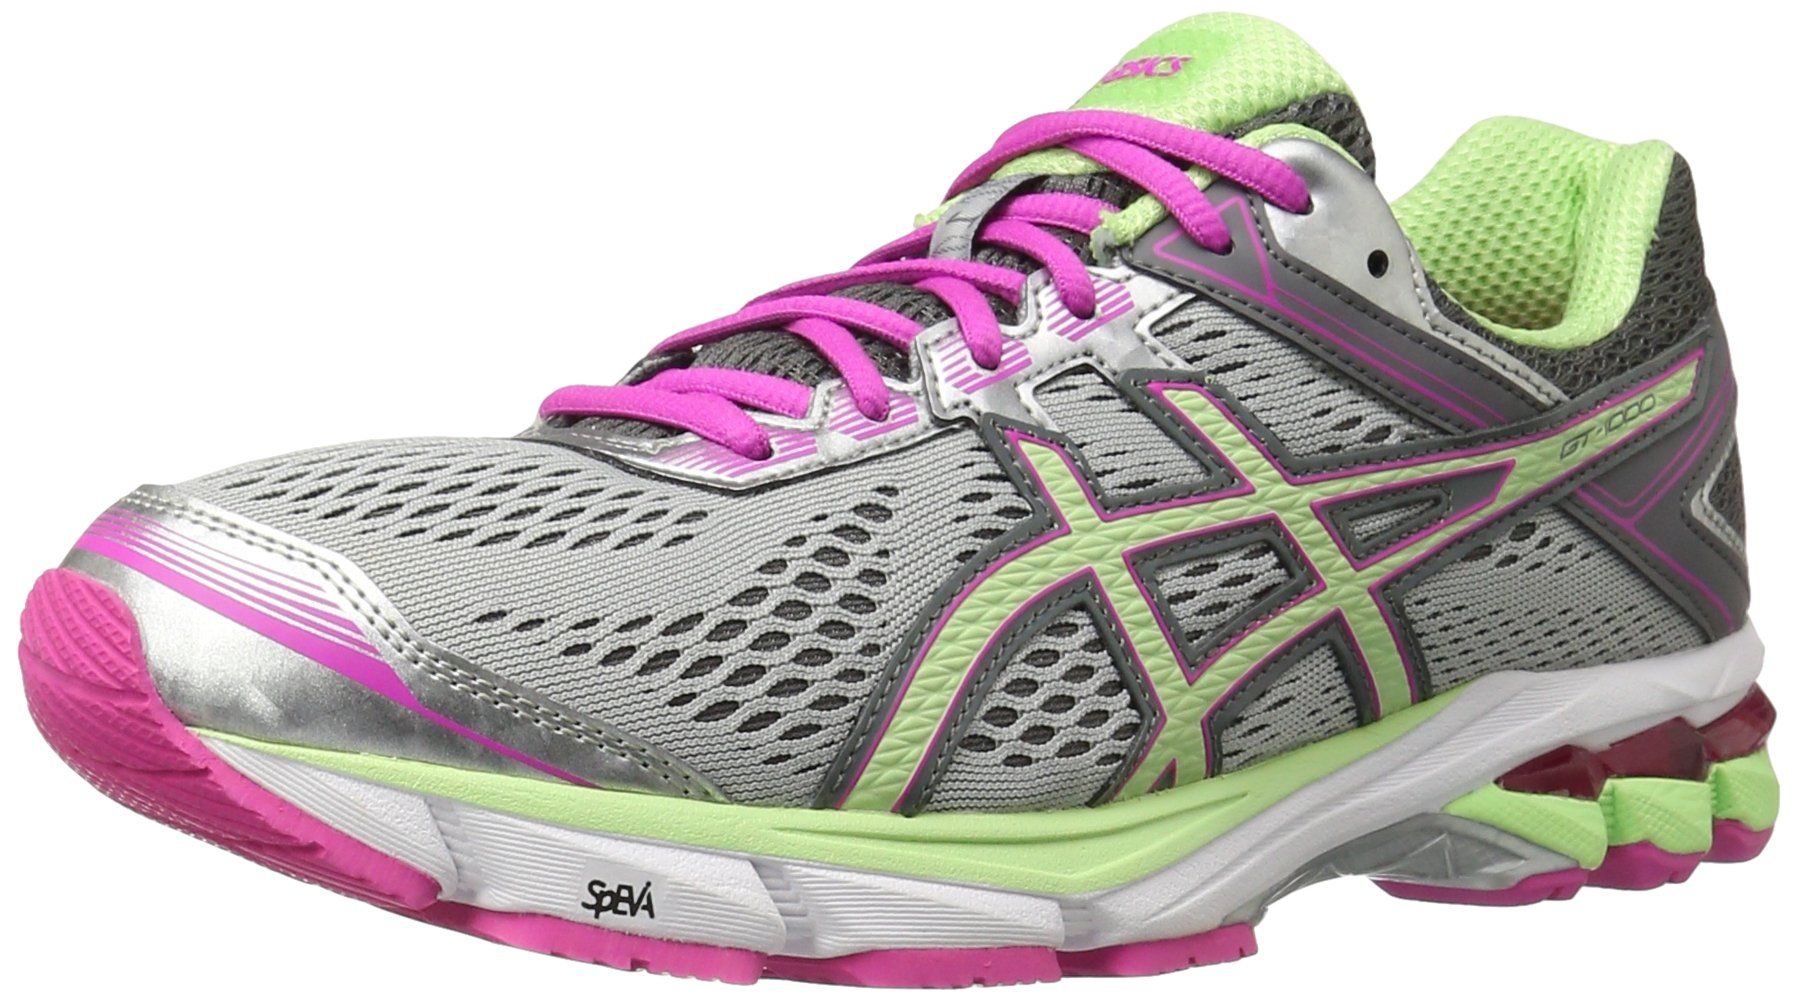 ASICS Women s Gt-1000 4 Running Shoe, Silver Pistachio Pink Glow, 6 ... 555697361f92